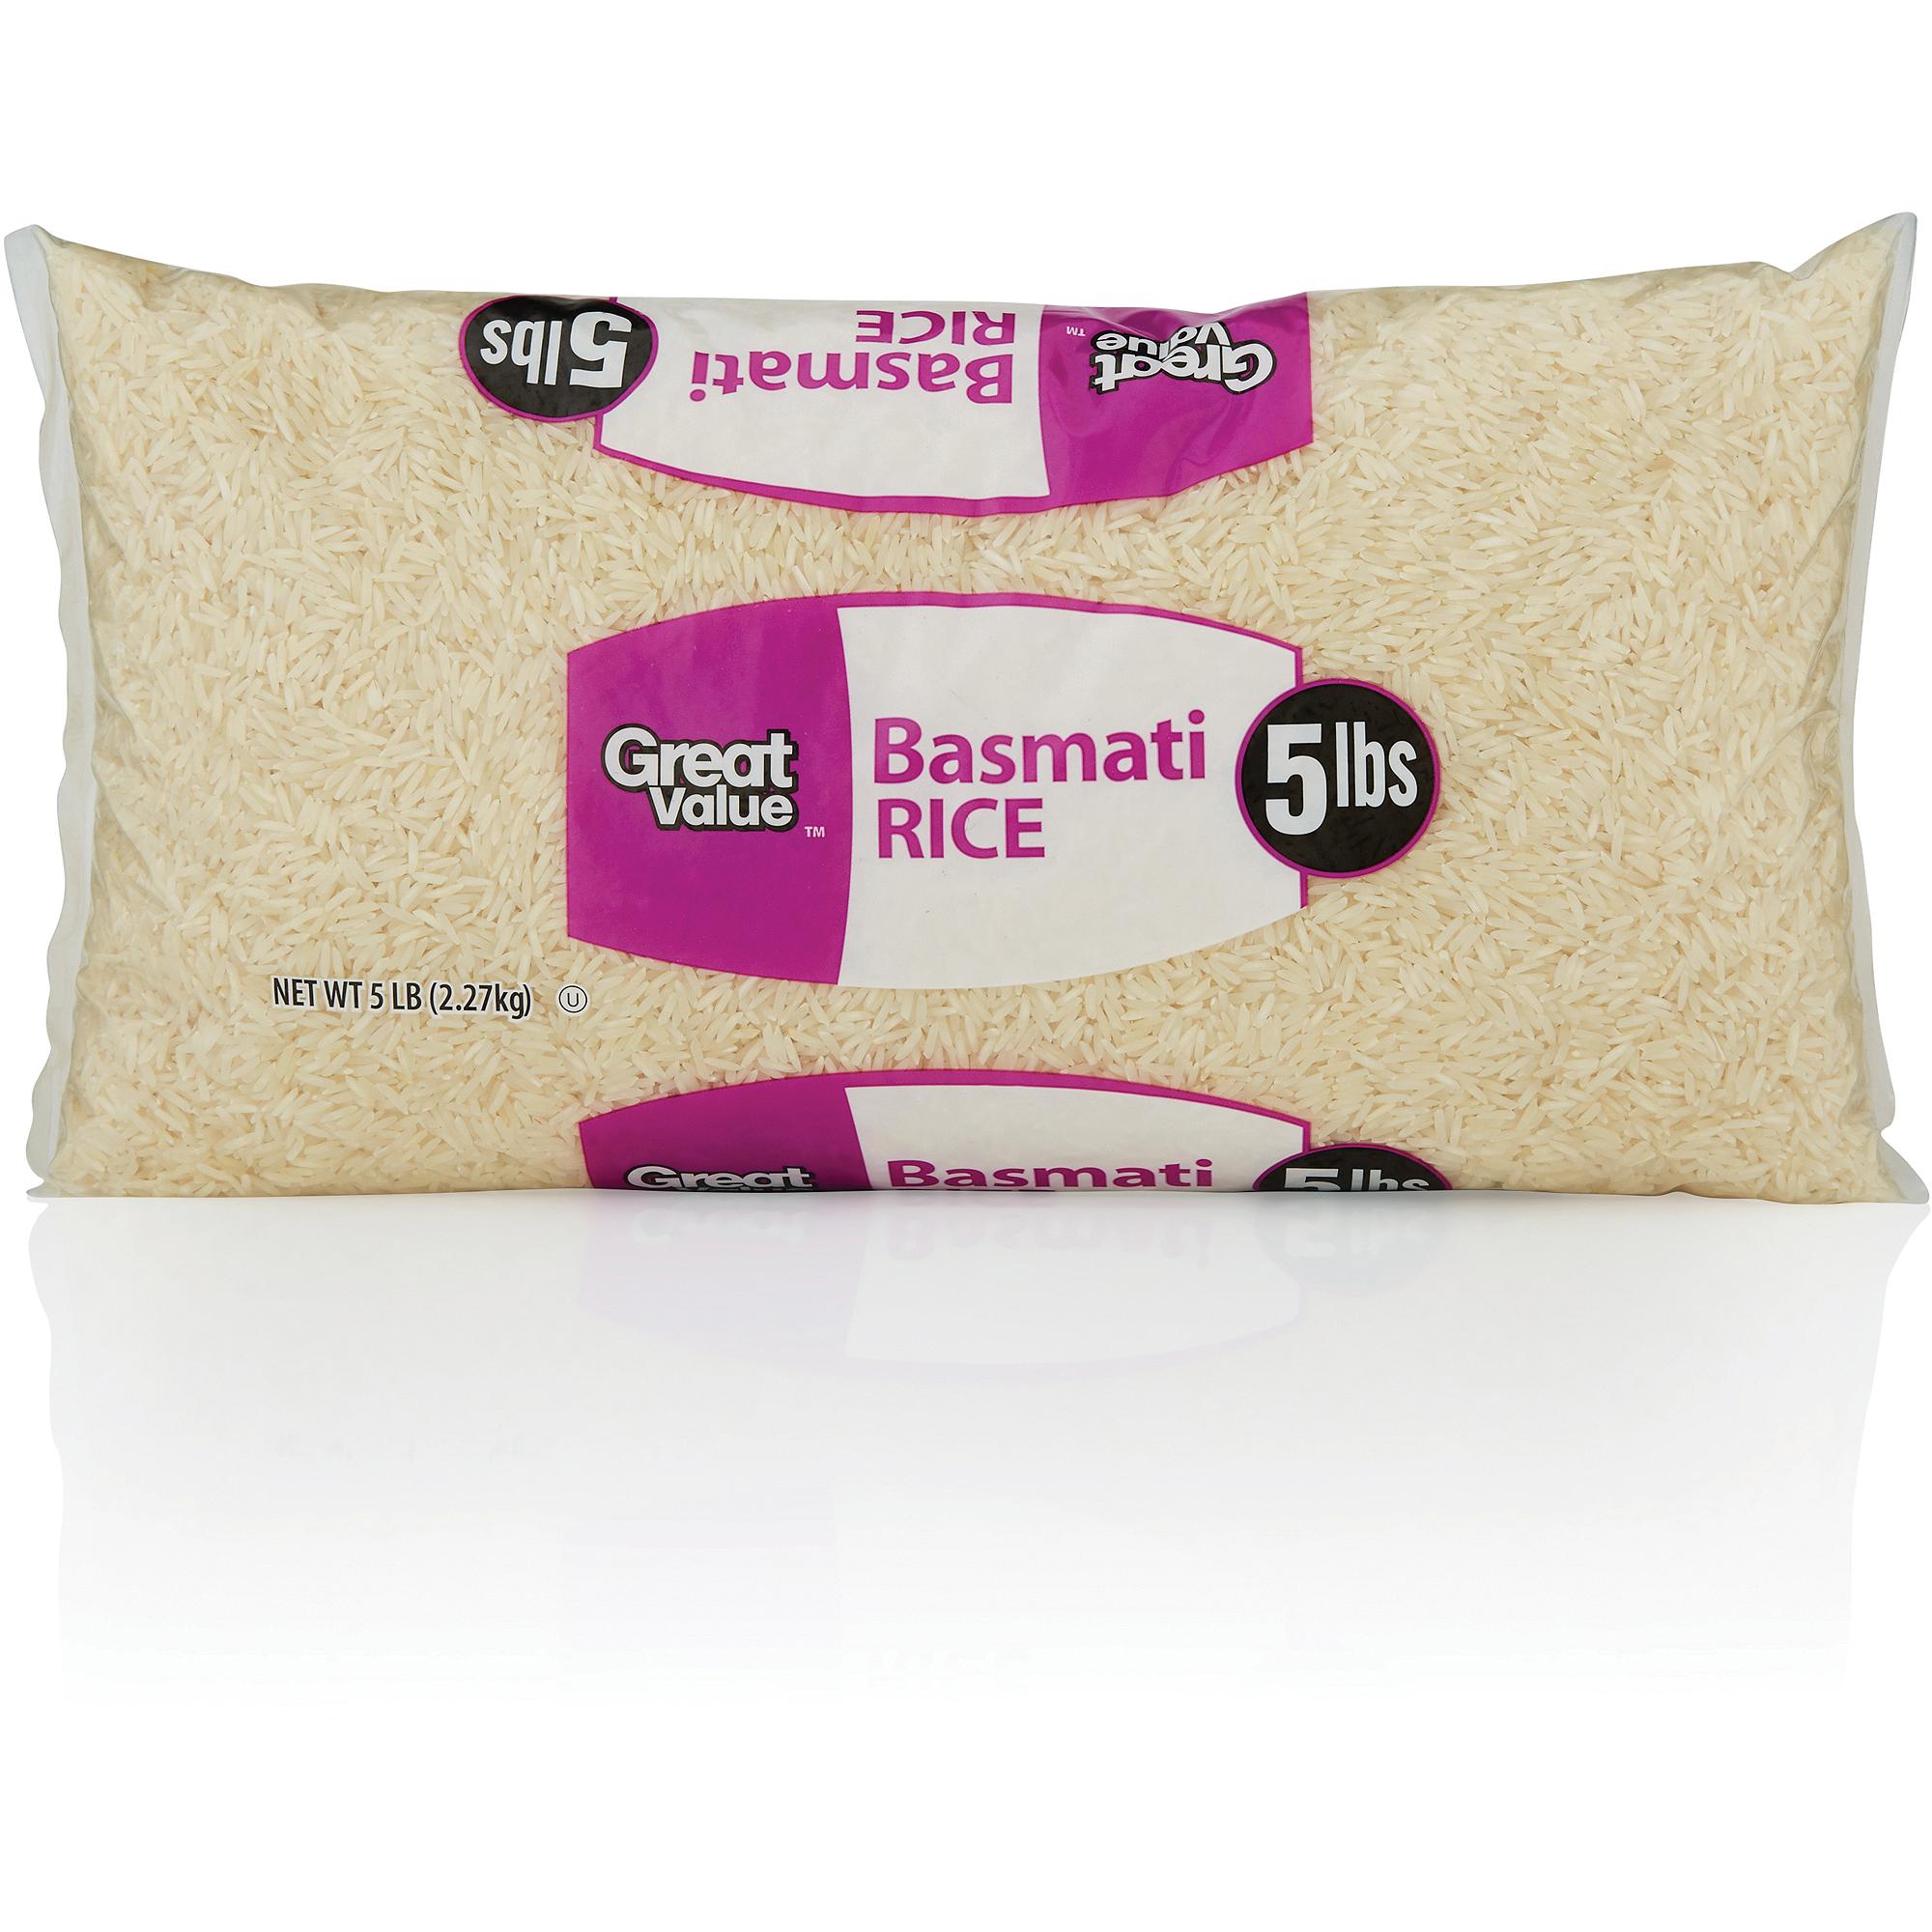 Great Value Gv Basmati Rice 5lb